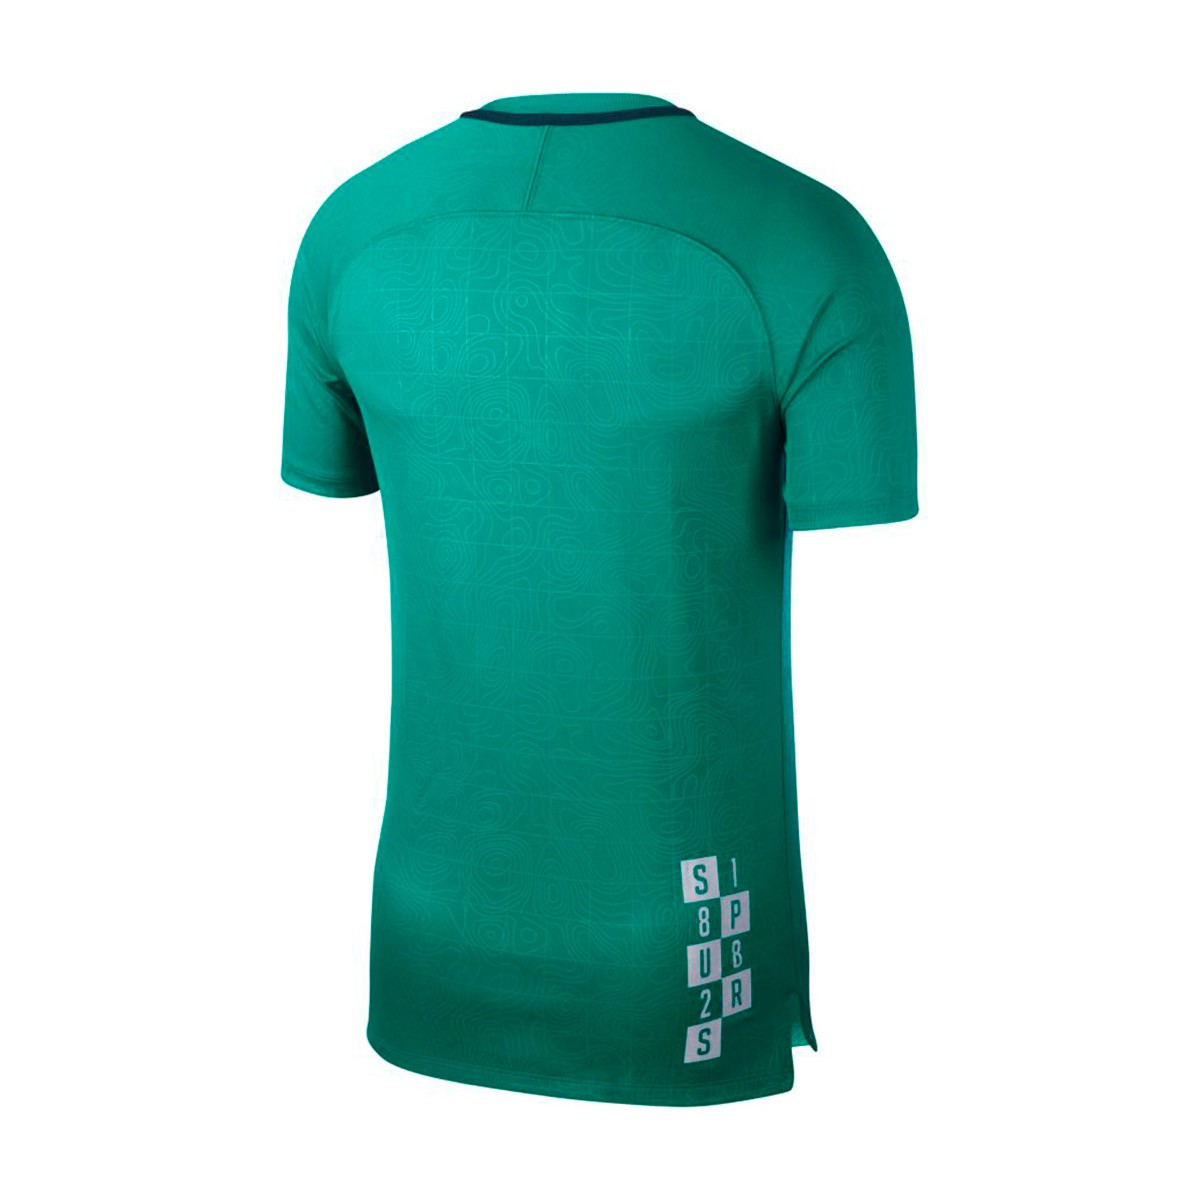 release date 0adbe df1bb Camiseta Dry Tottenham Hotspur FC Squad 2018-2019 Neptune green-Armory navy